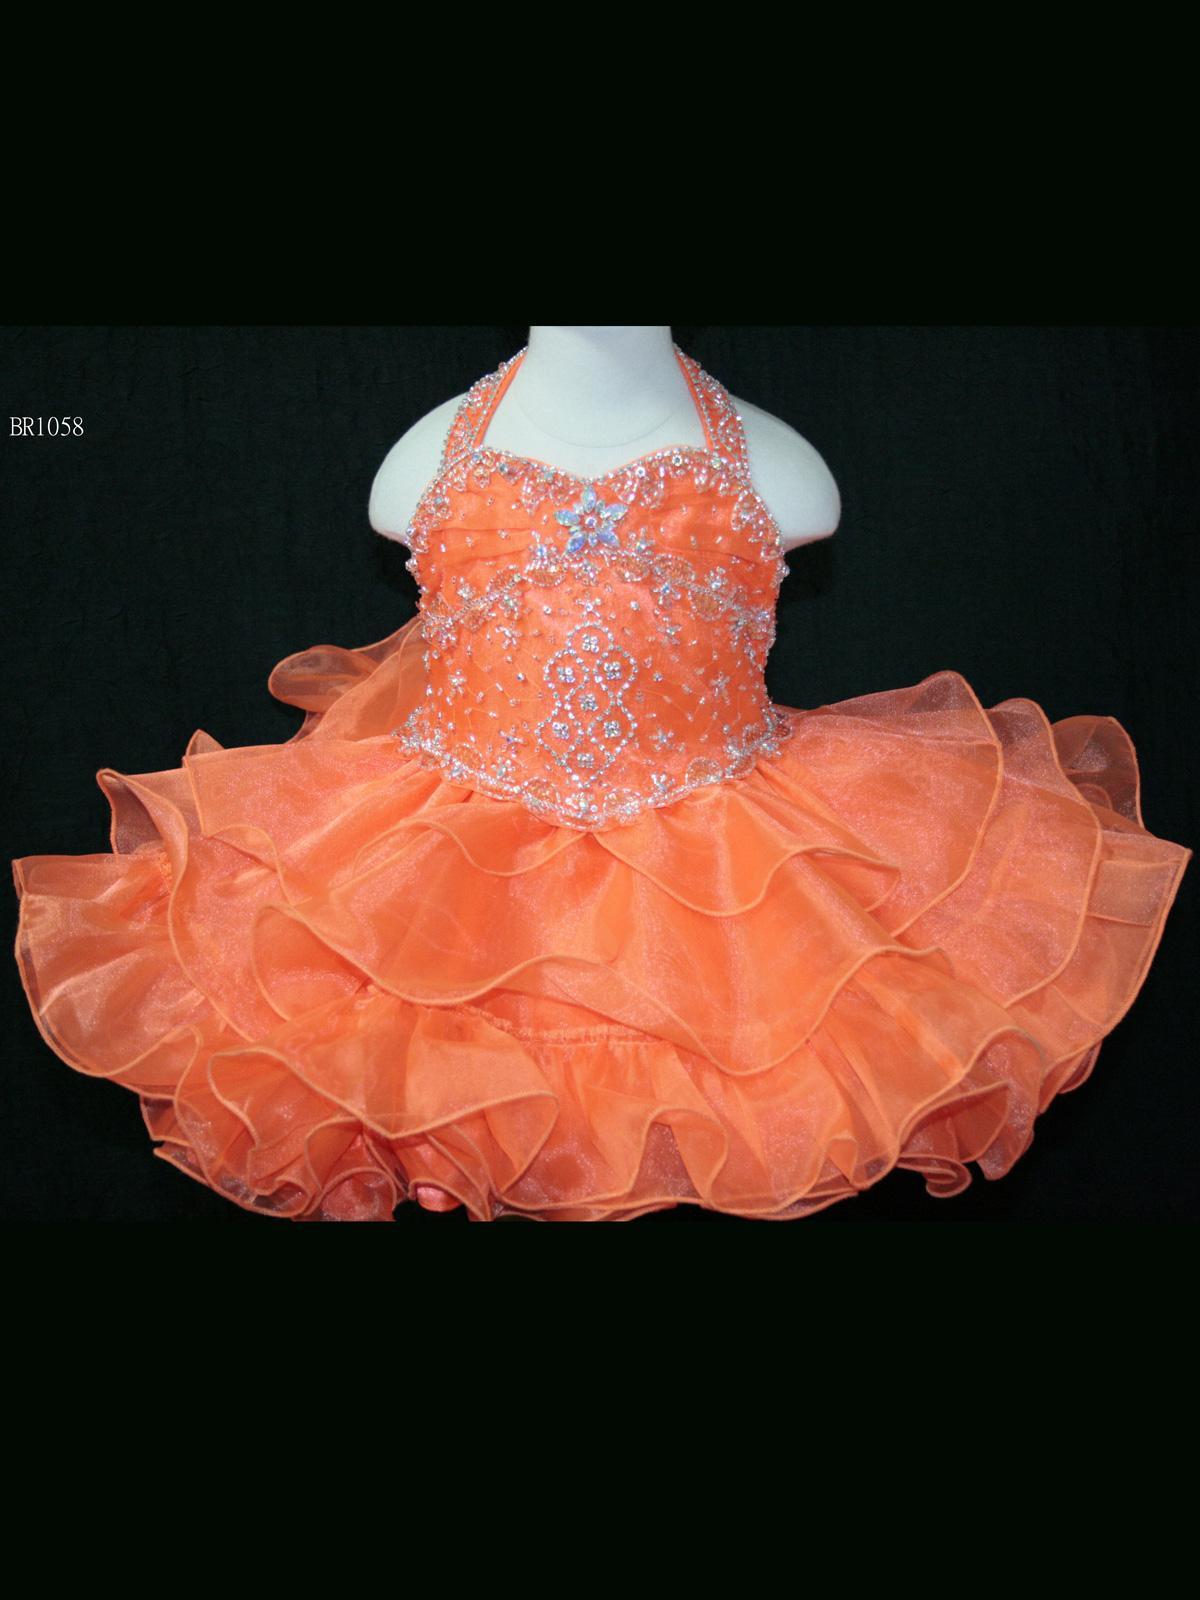 Wholesale Charming Orange Girls Pageant Dresses Beading Bodice Halter Neck Zipper Back Little Girls Dresses Tiered Ruffle Skirt Pleated